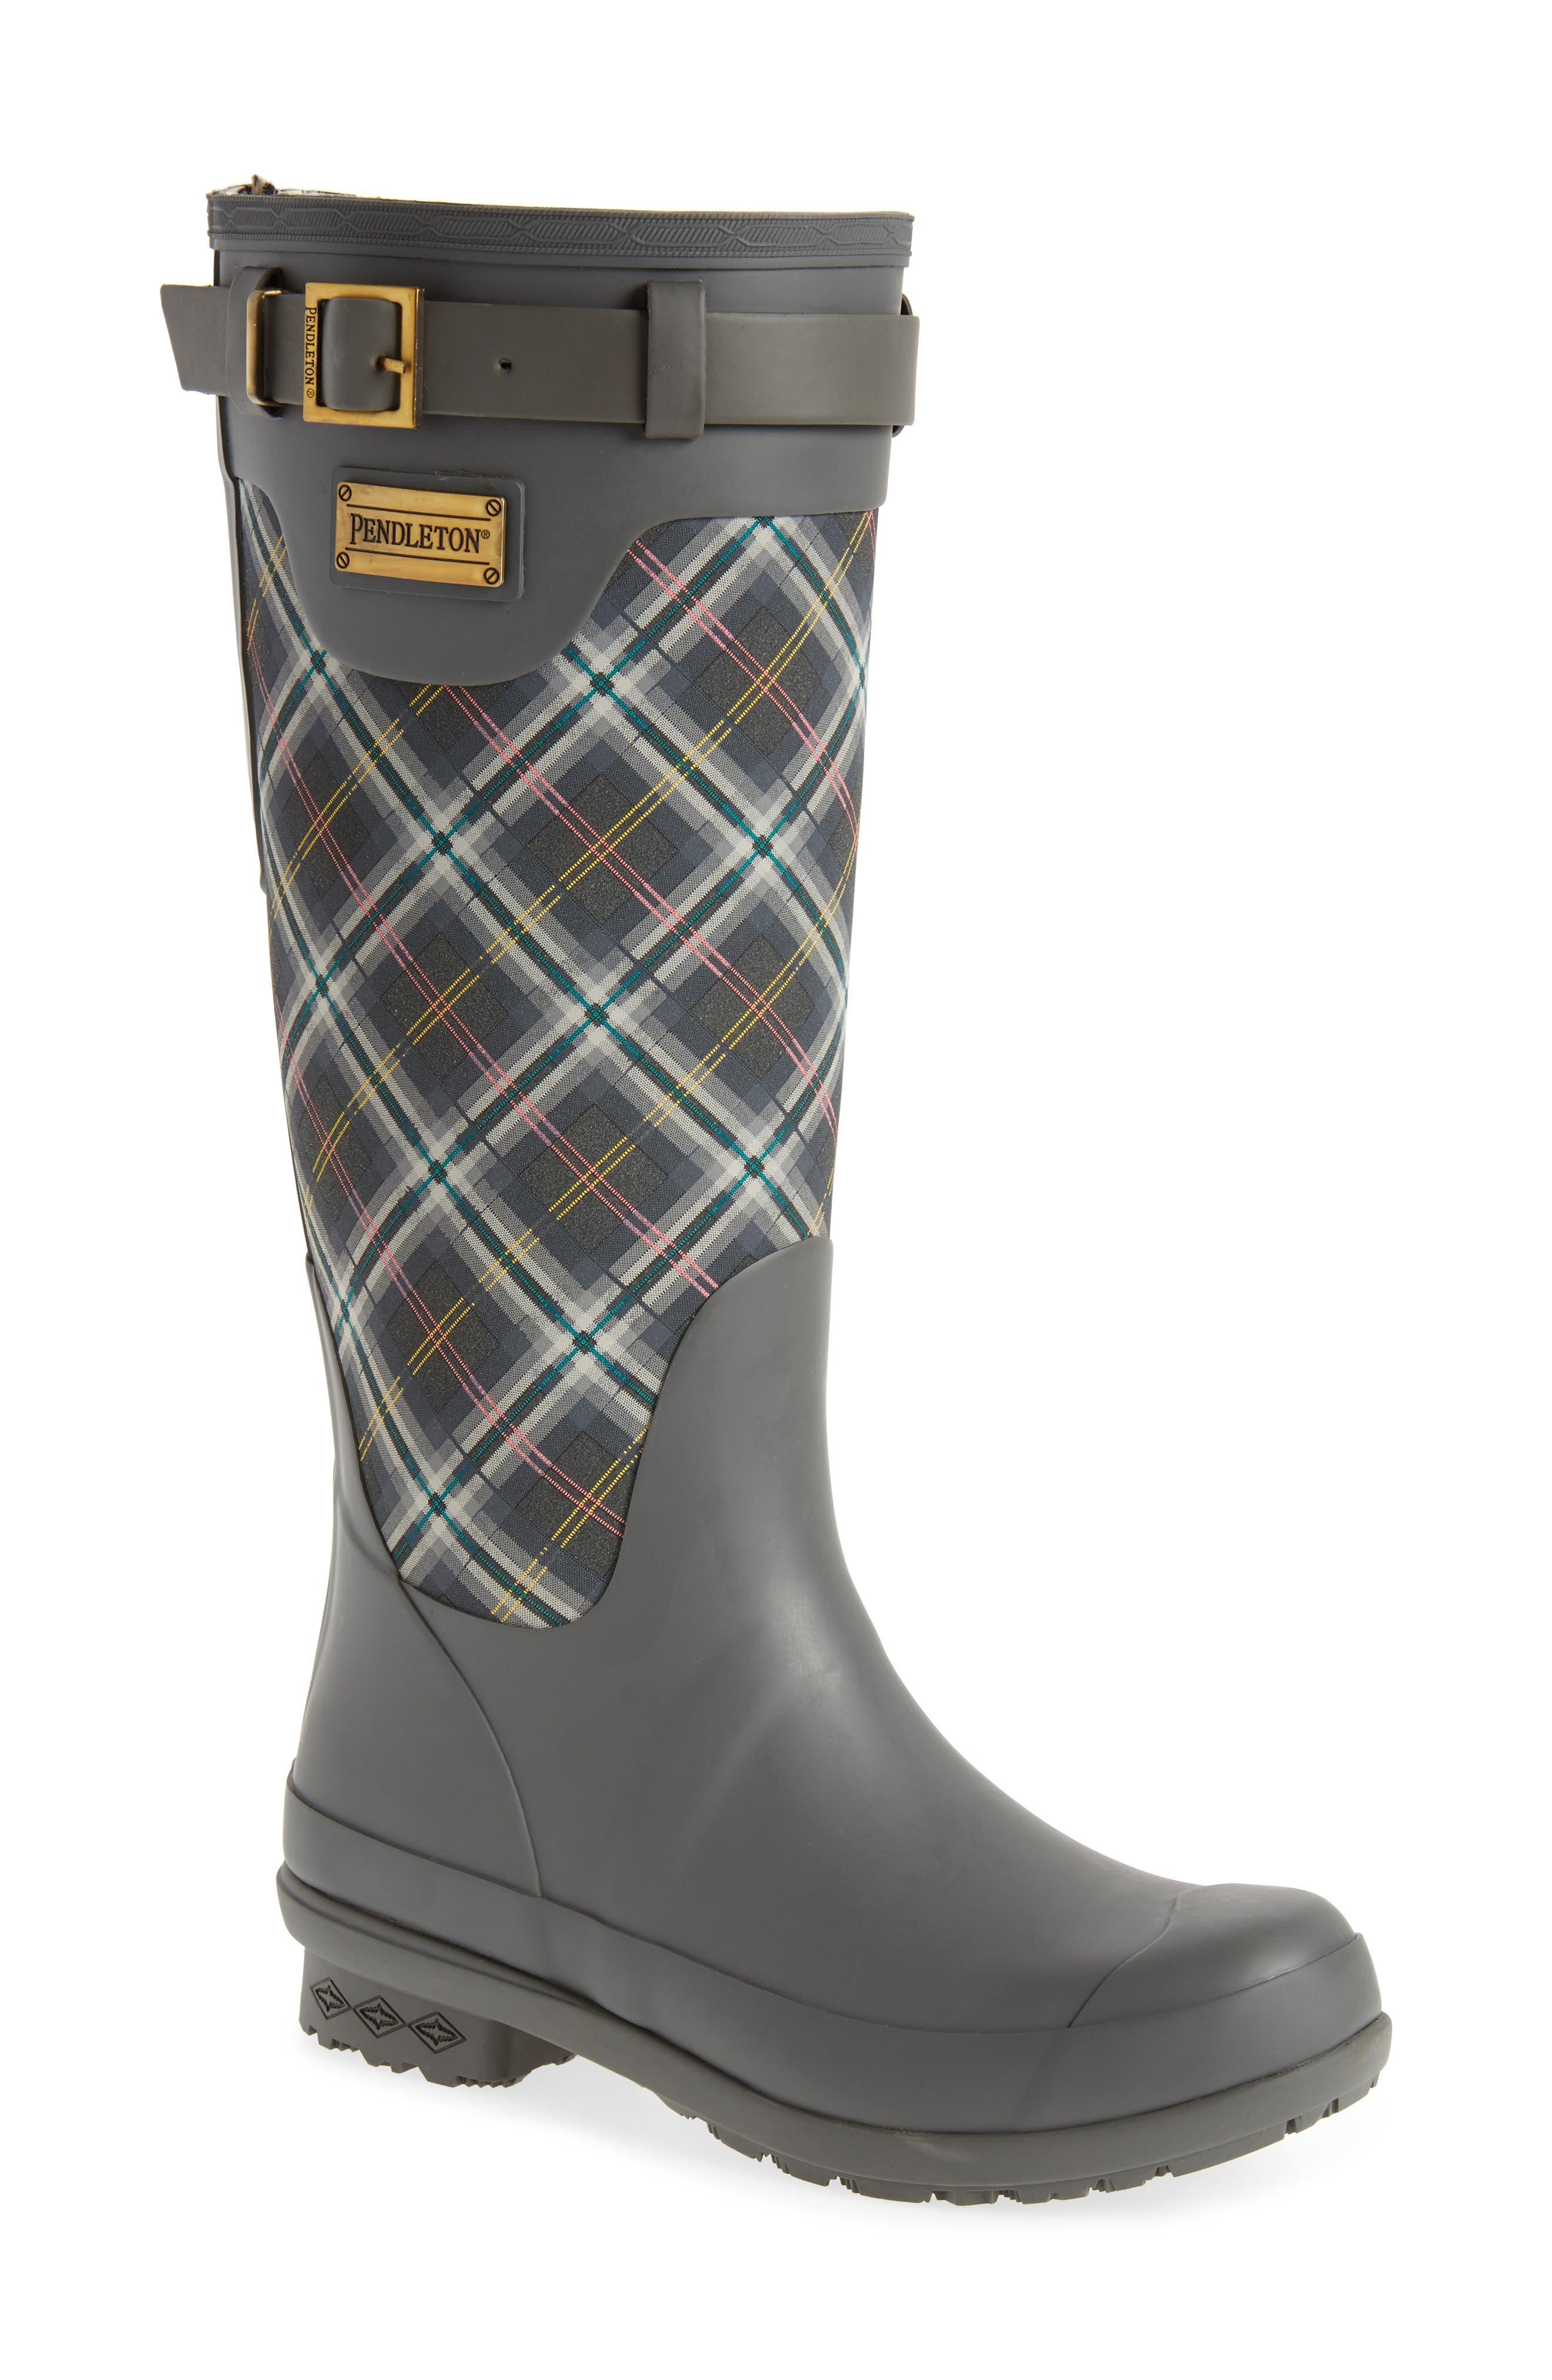 Main Image - Pendleton Oxford Rain Boot (Women)